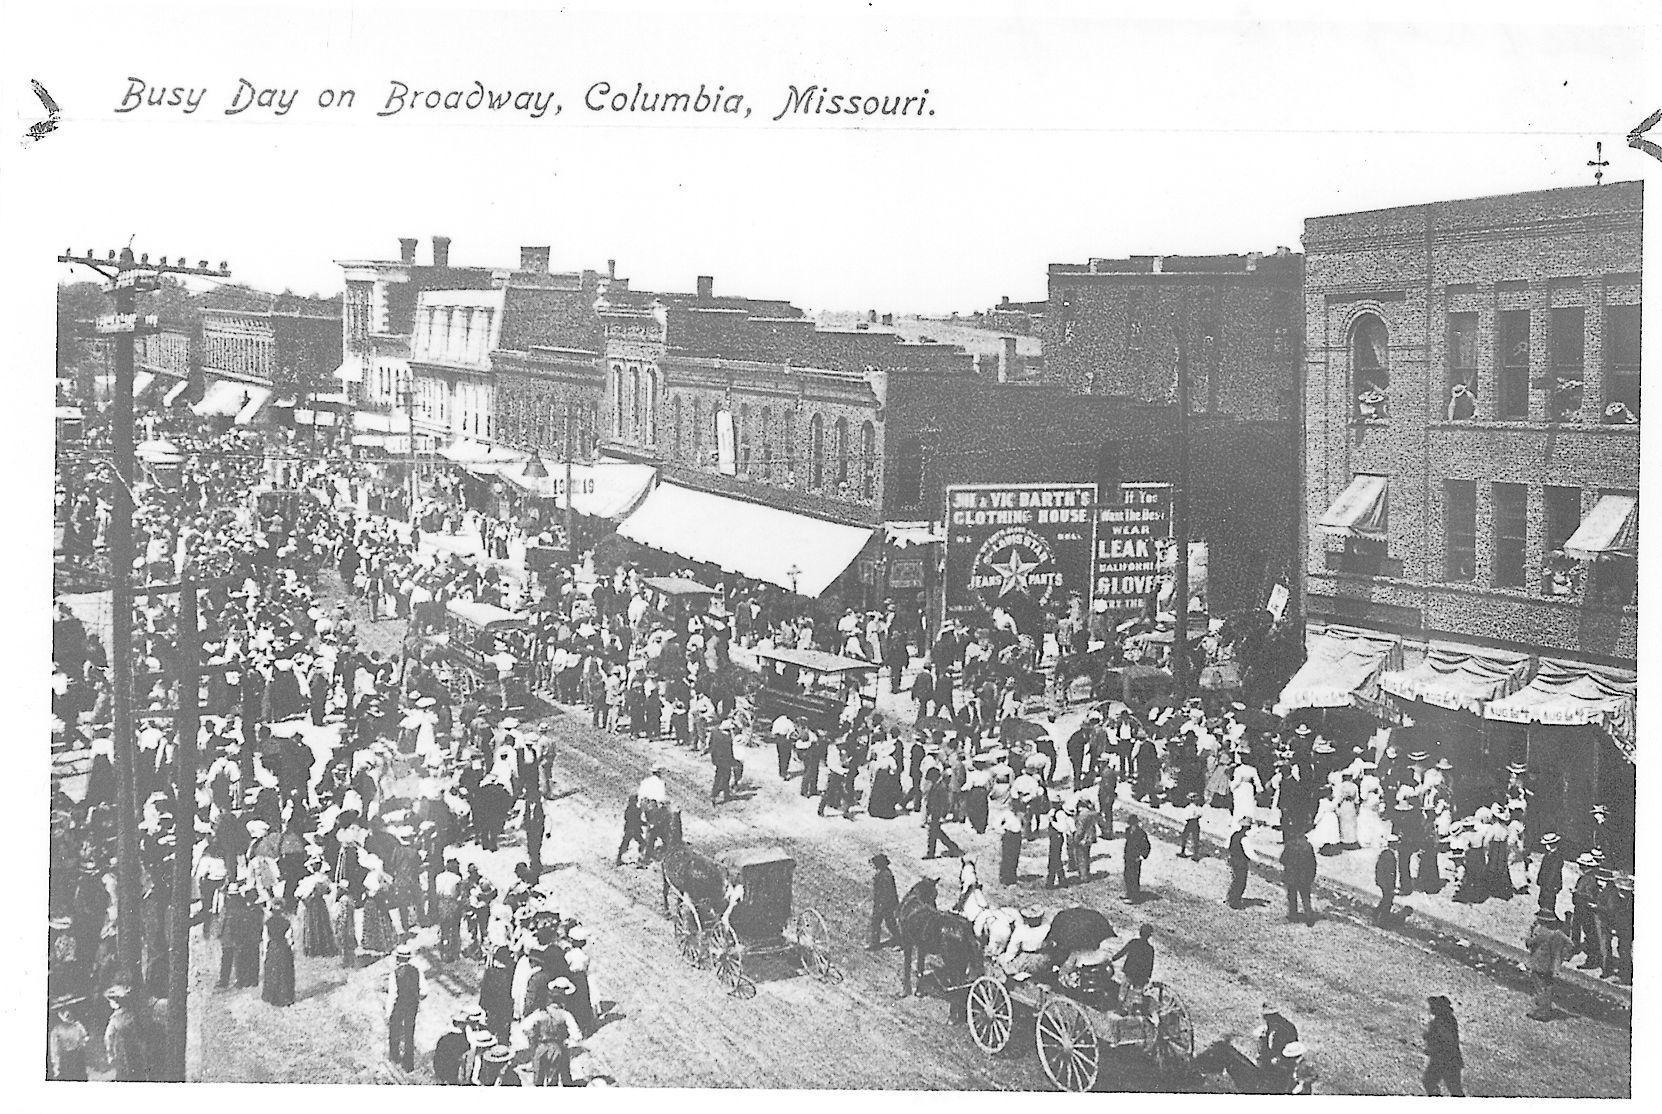 Columbia, Missouri